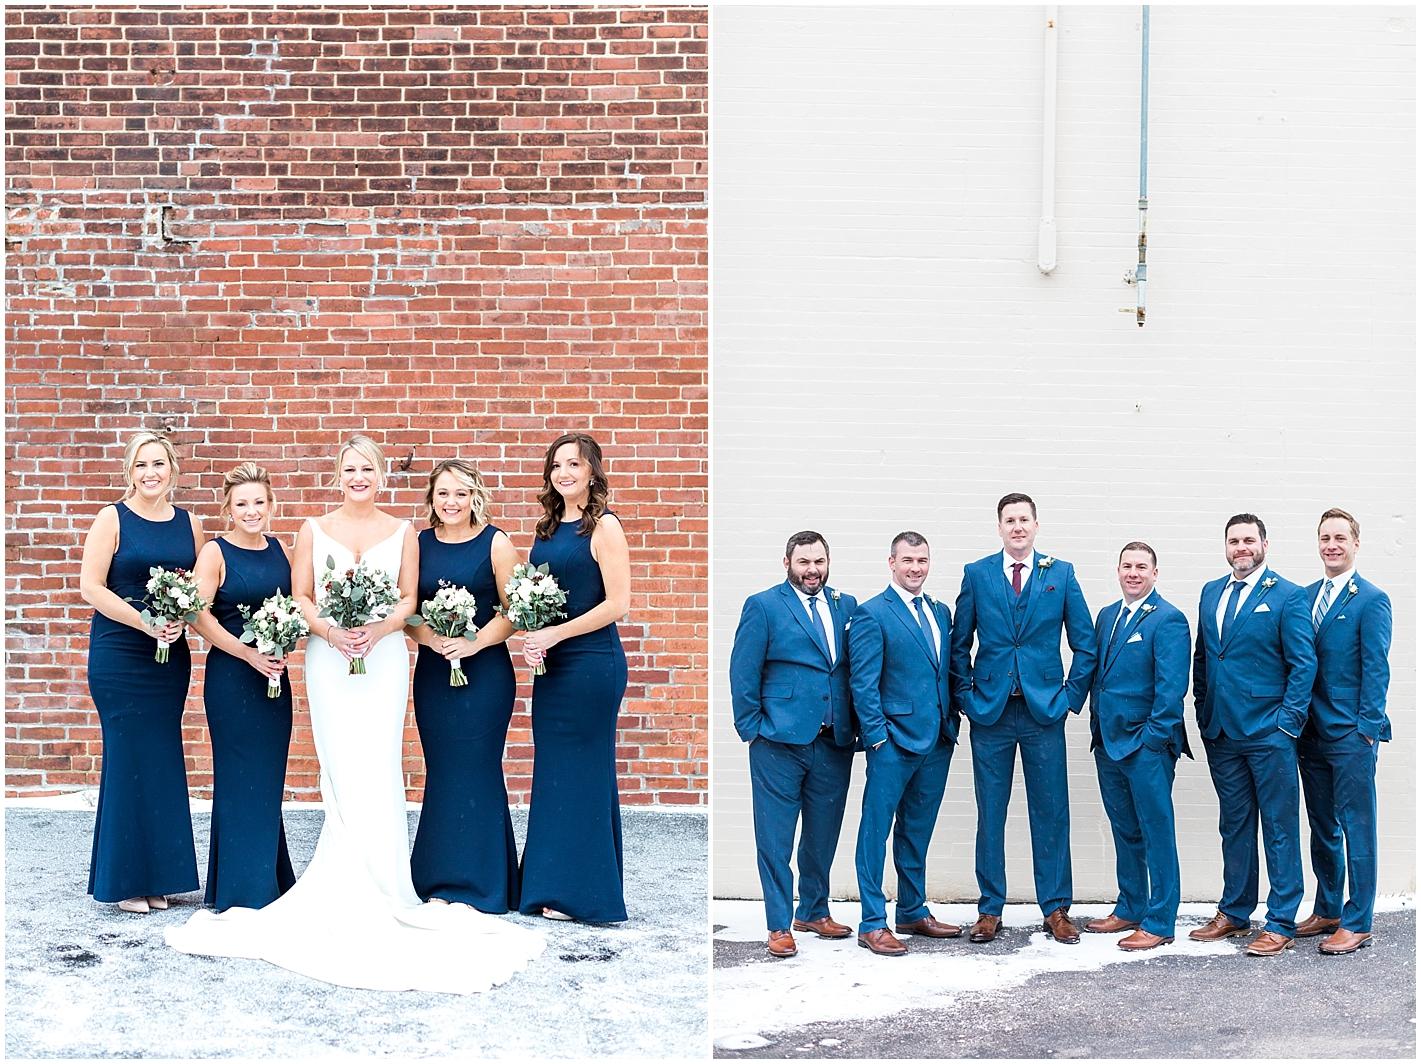 Plymouth Massachusetts weddings Photo by Alyssa Parker Photography